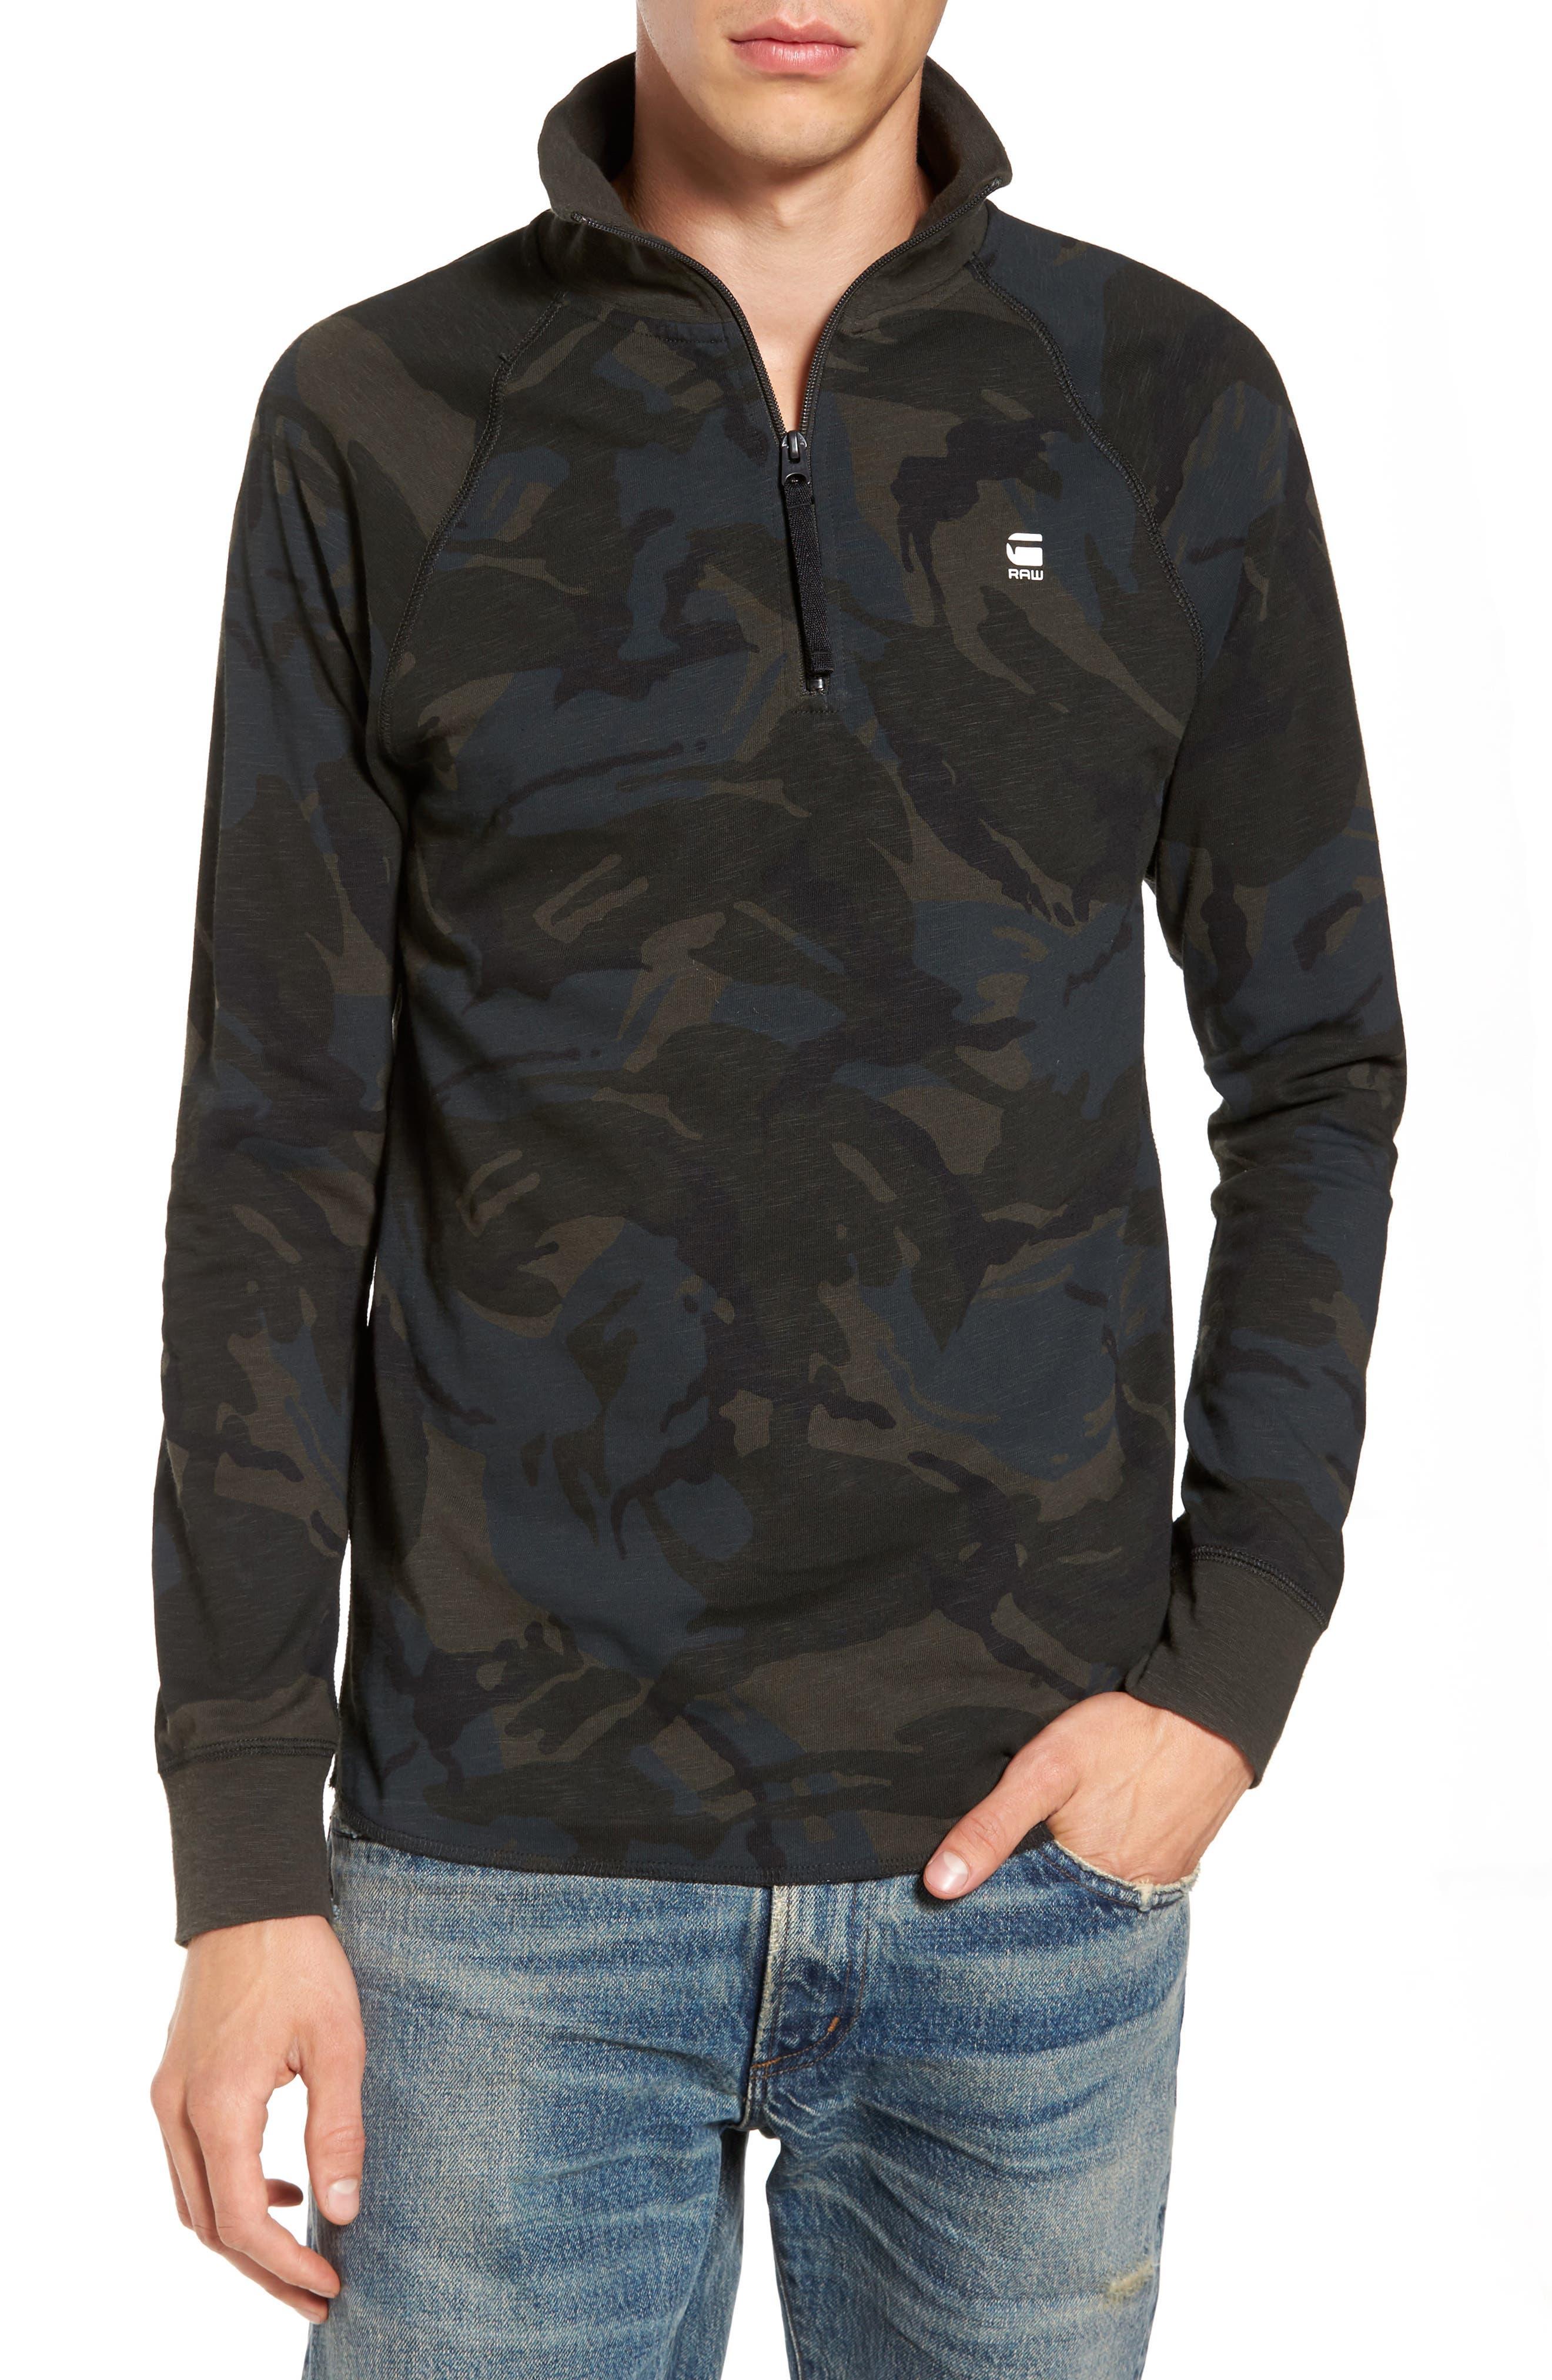 Main Image - G-Star Raw Jirgi Quarter Zip Jacket